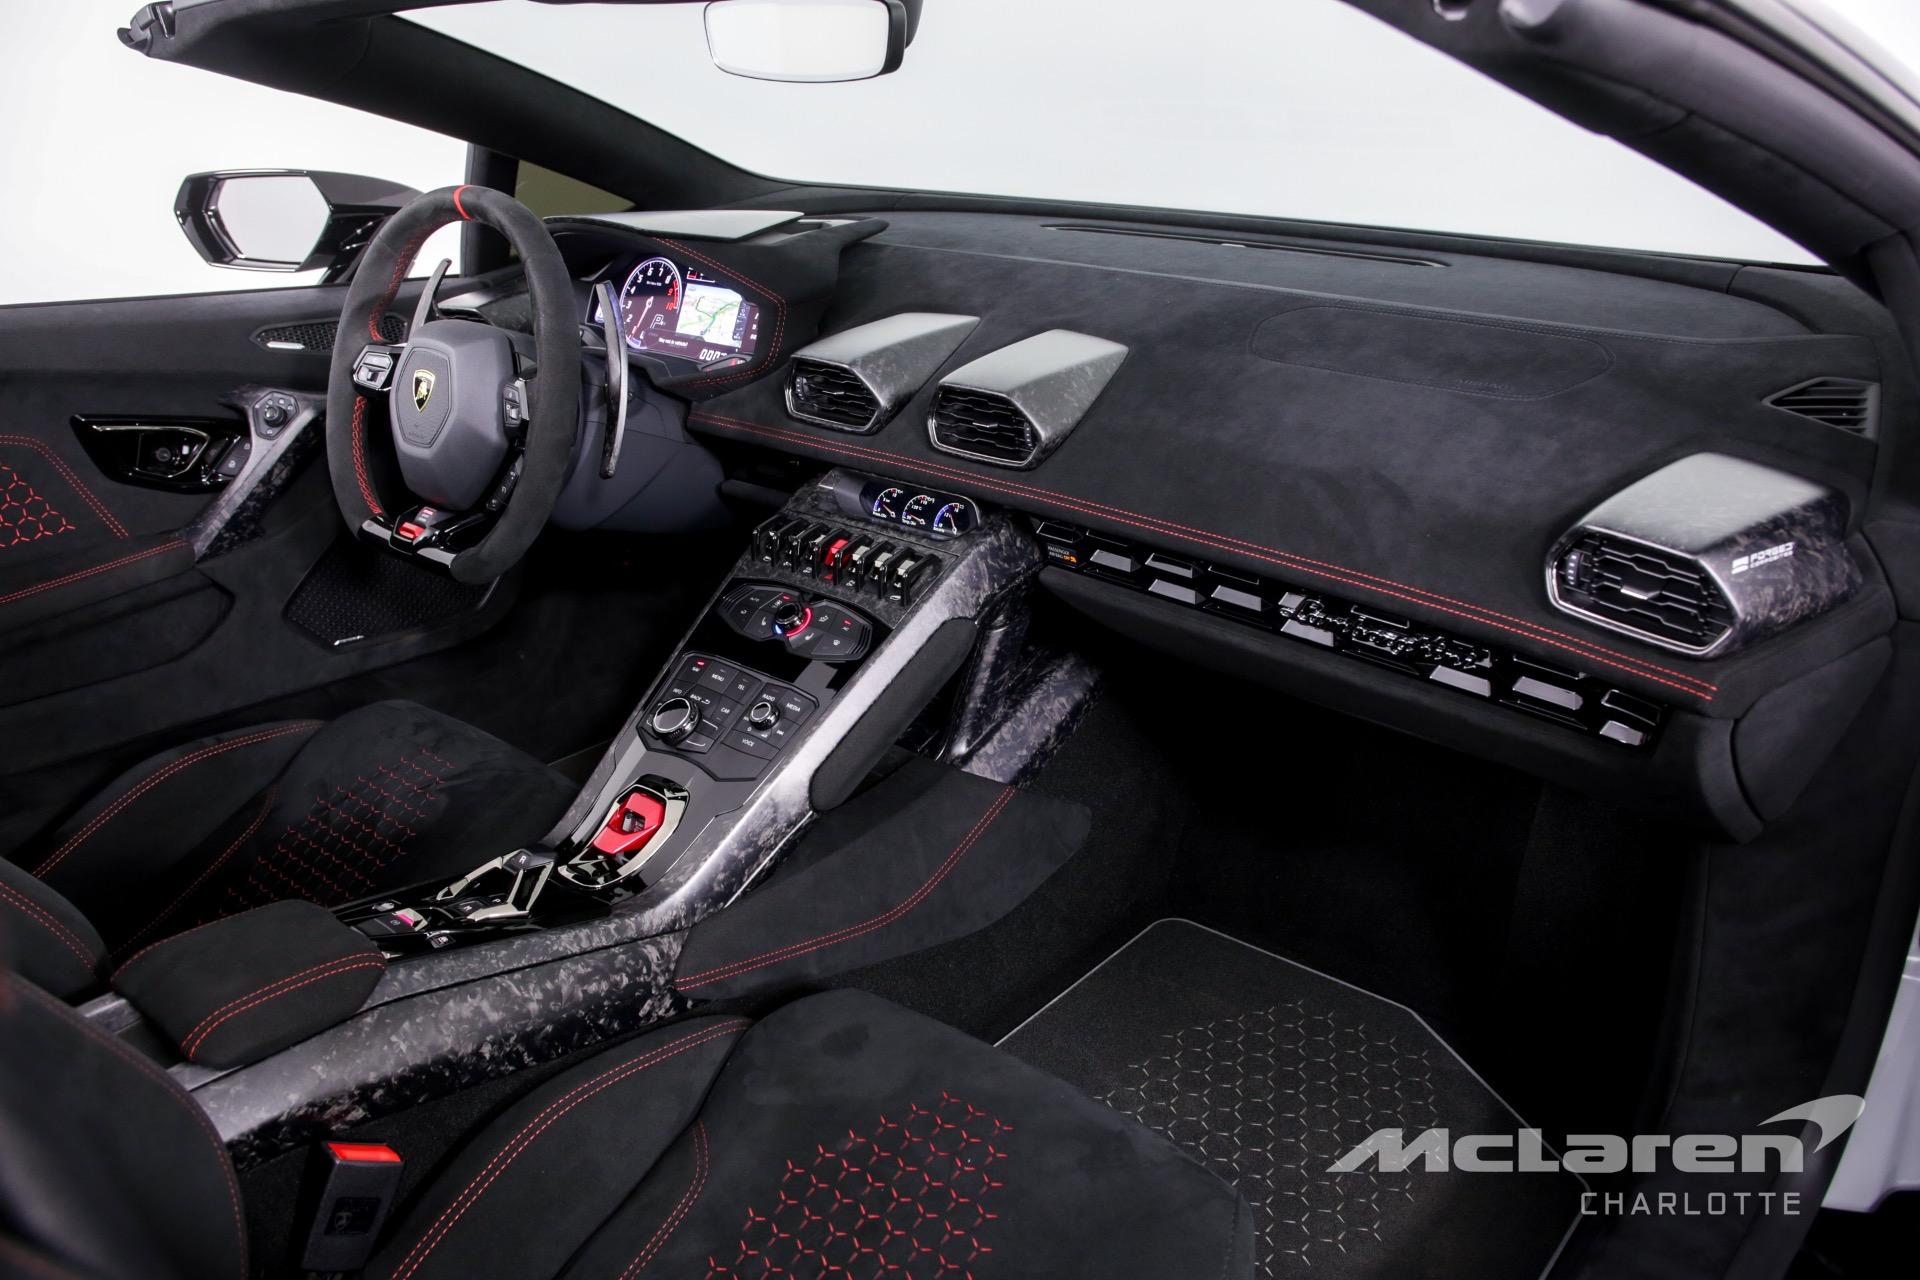 Used 2018 Lamborghini Huracan LP 640-4 Performante Spyder   Charlotte, NC